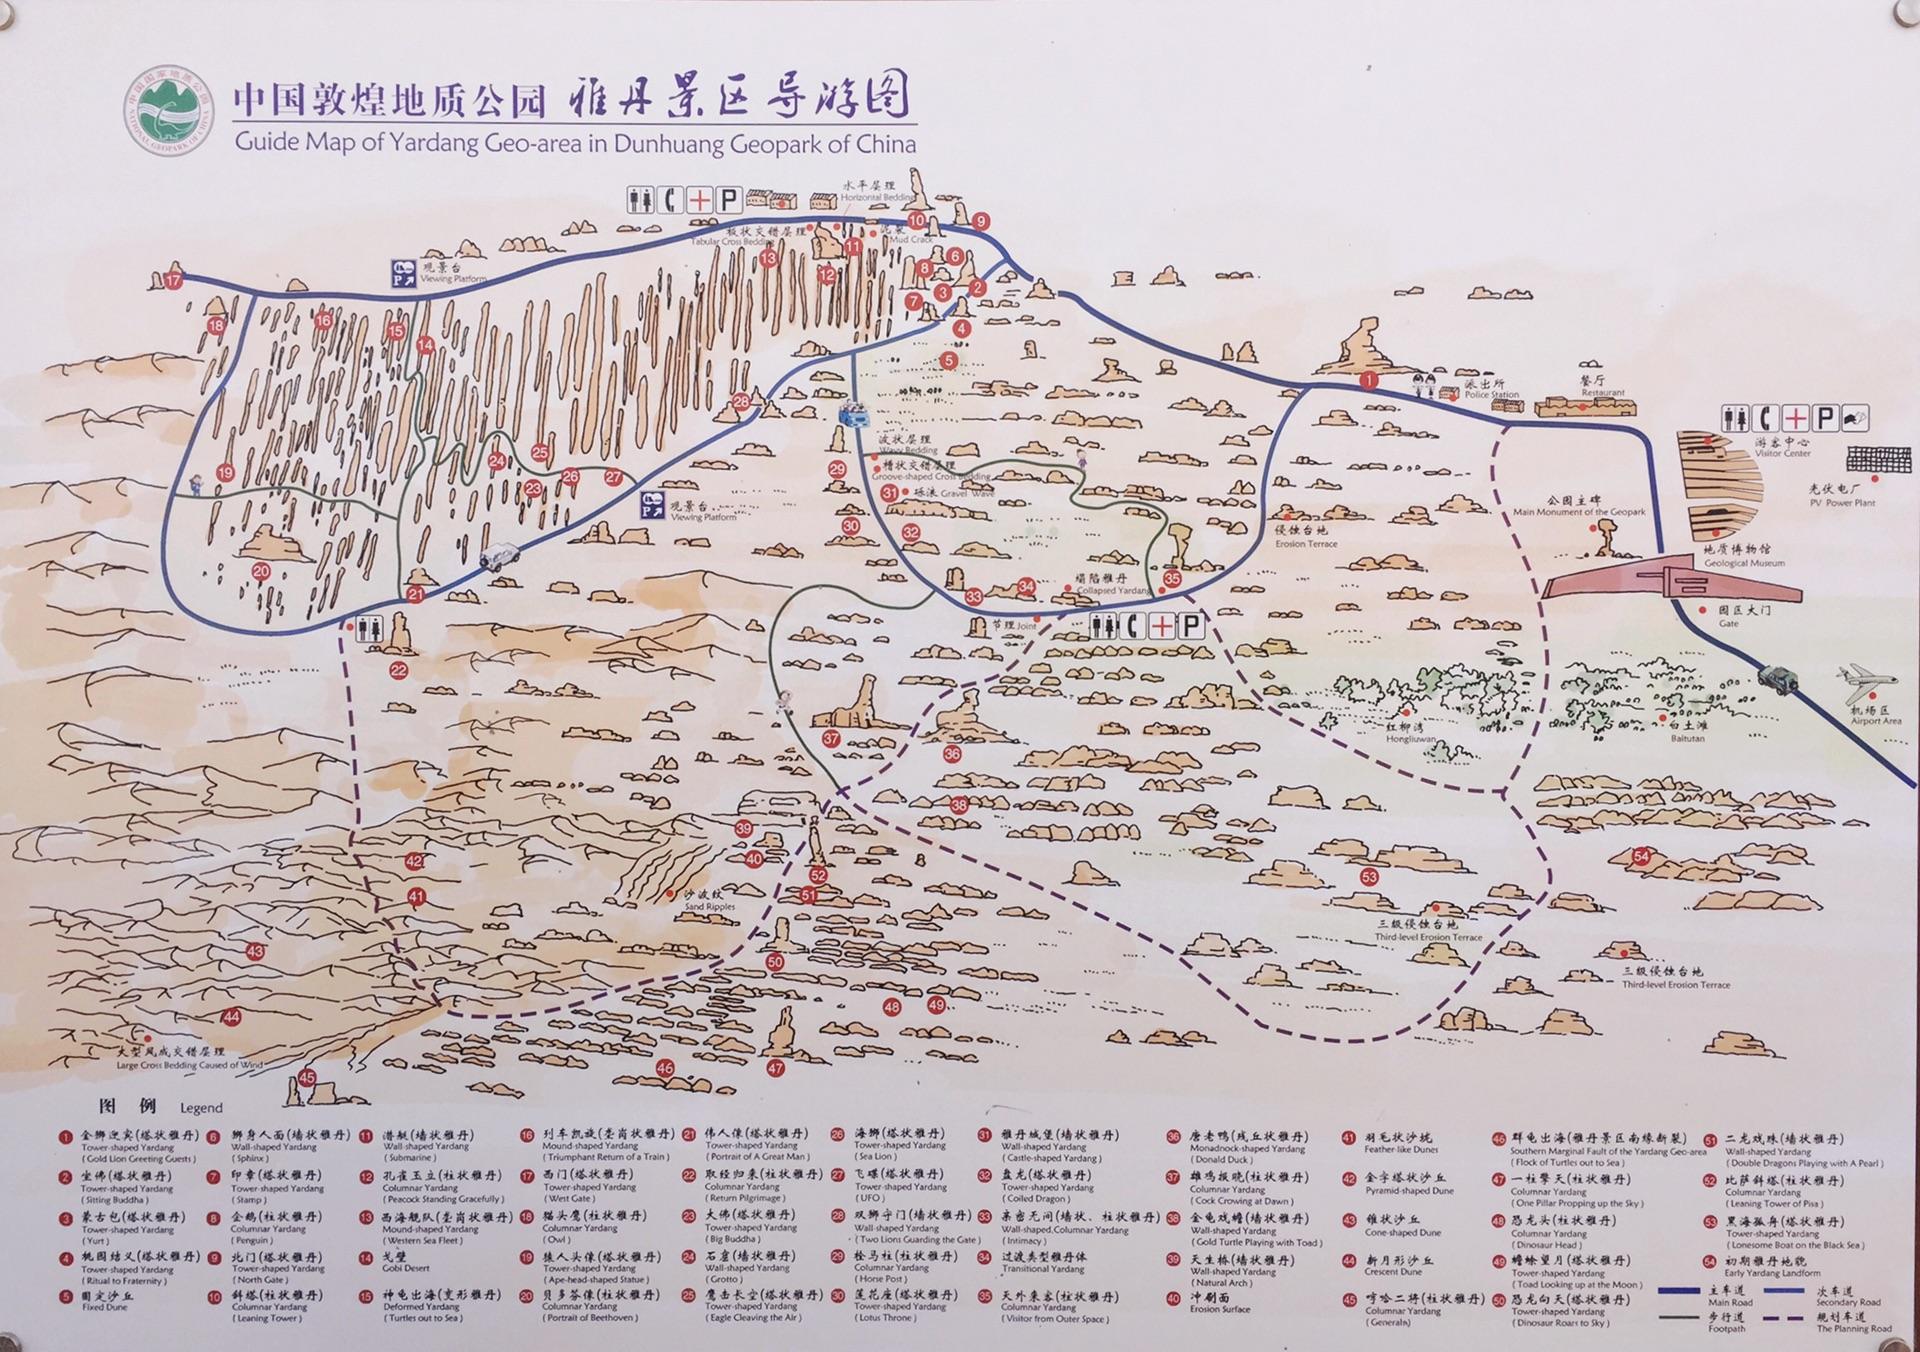 DunHuang yadan geo park tourist map